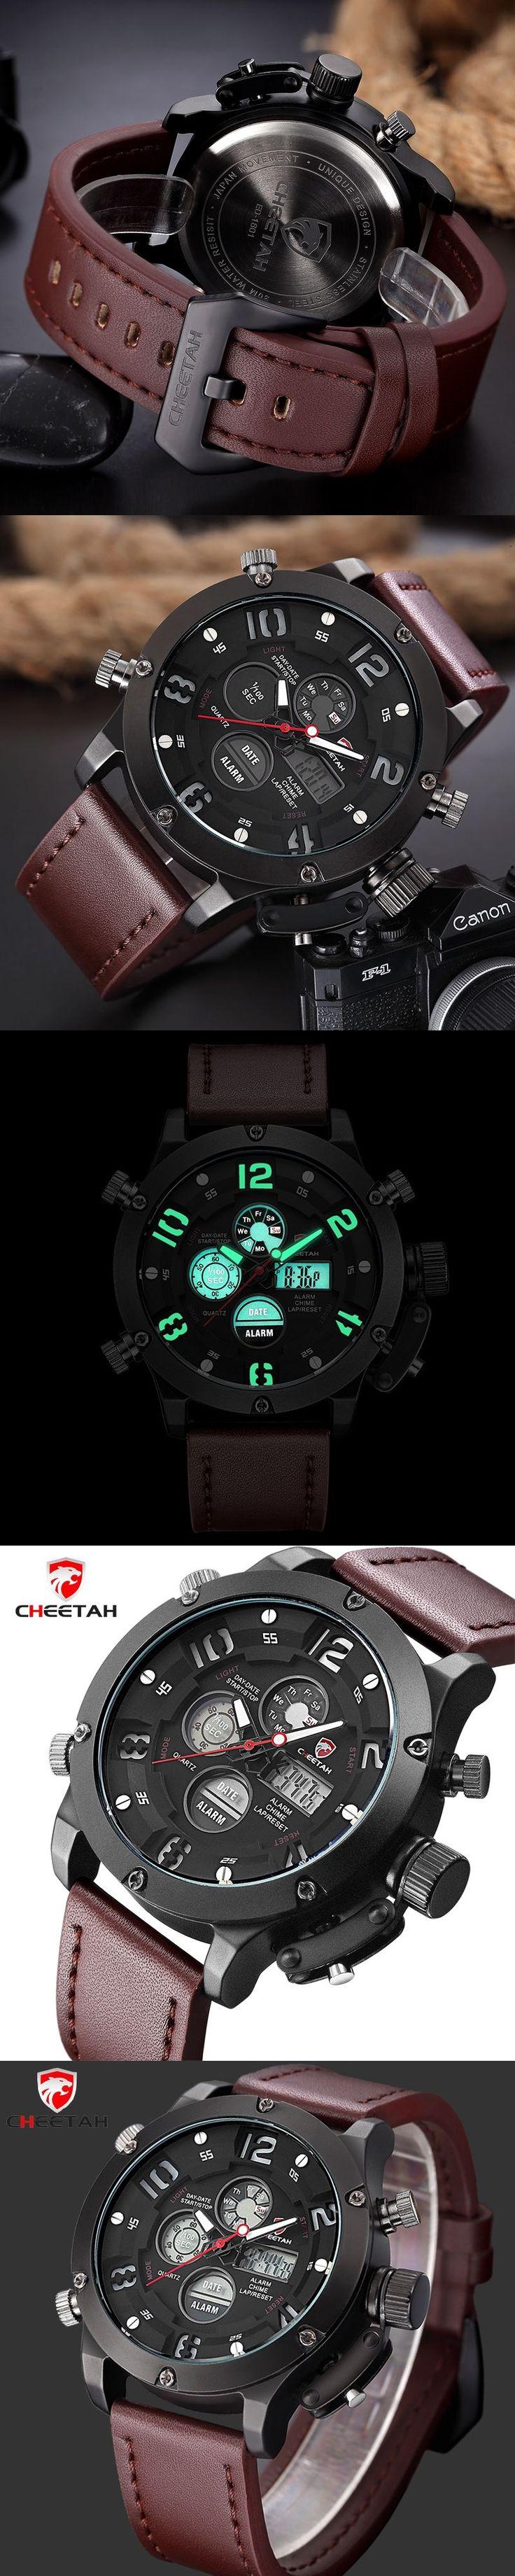 CHEETAH New Top Luxury Brand Men Sports Watches Men's Quartz Analog Led Clock Man Leather Army Military Wrist Watch #menswatchesmilitary